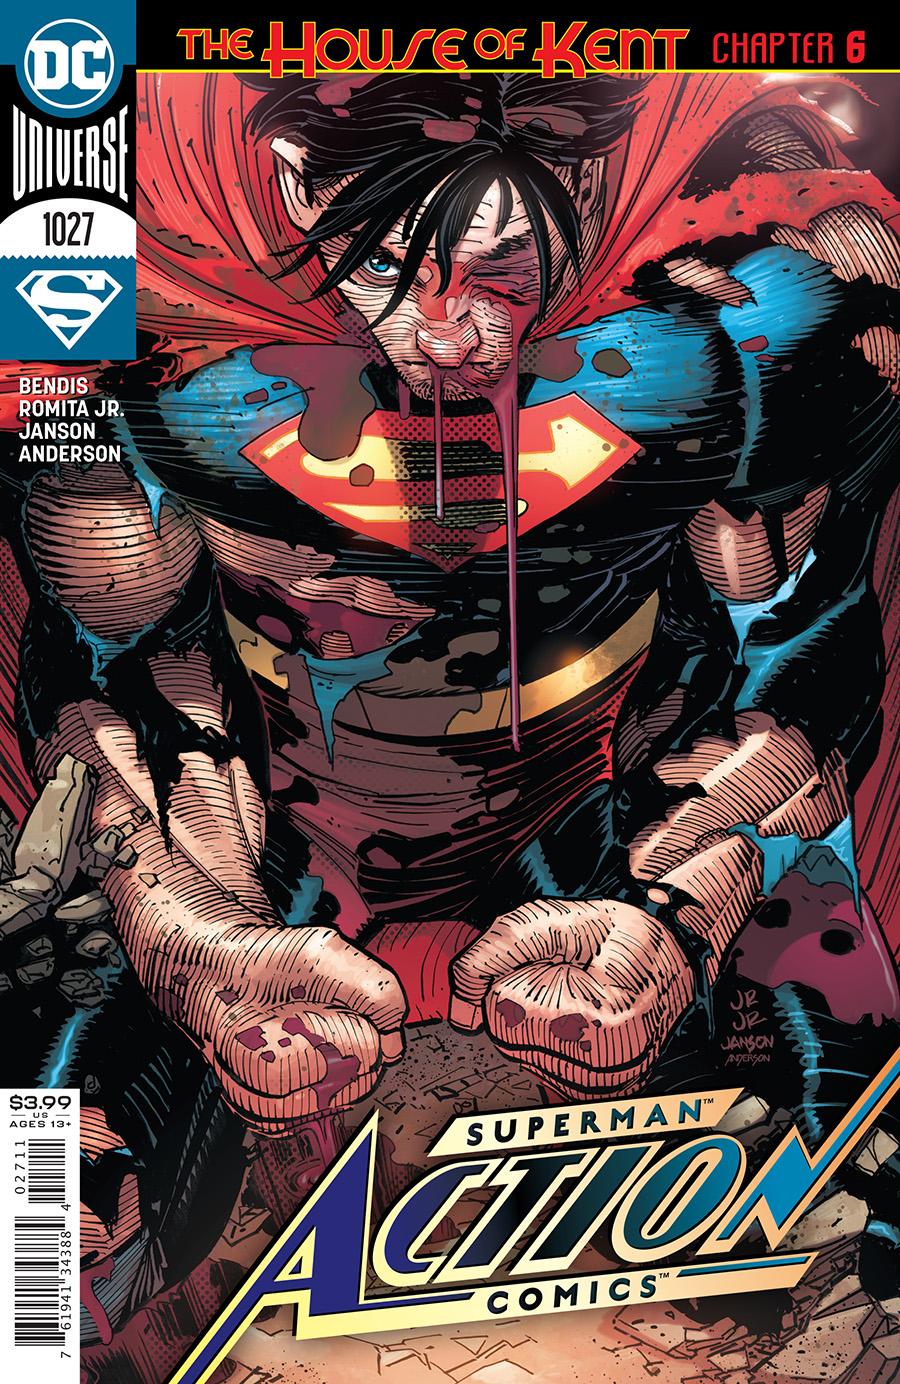 Action Comics Vol 1 #1027 Cover A John Romita Jr & Klaus Janson